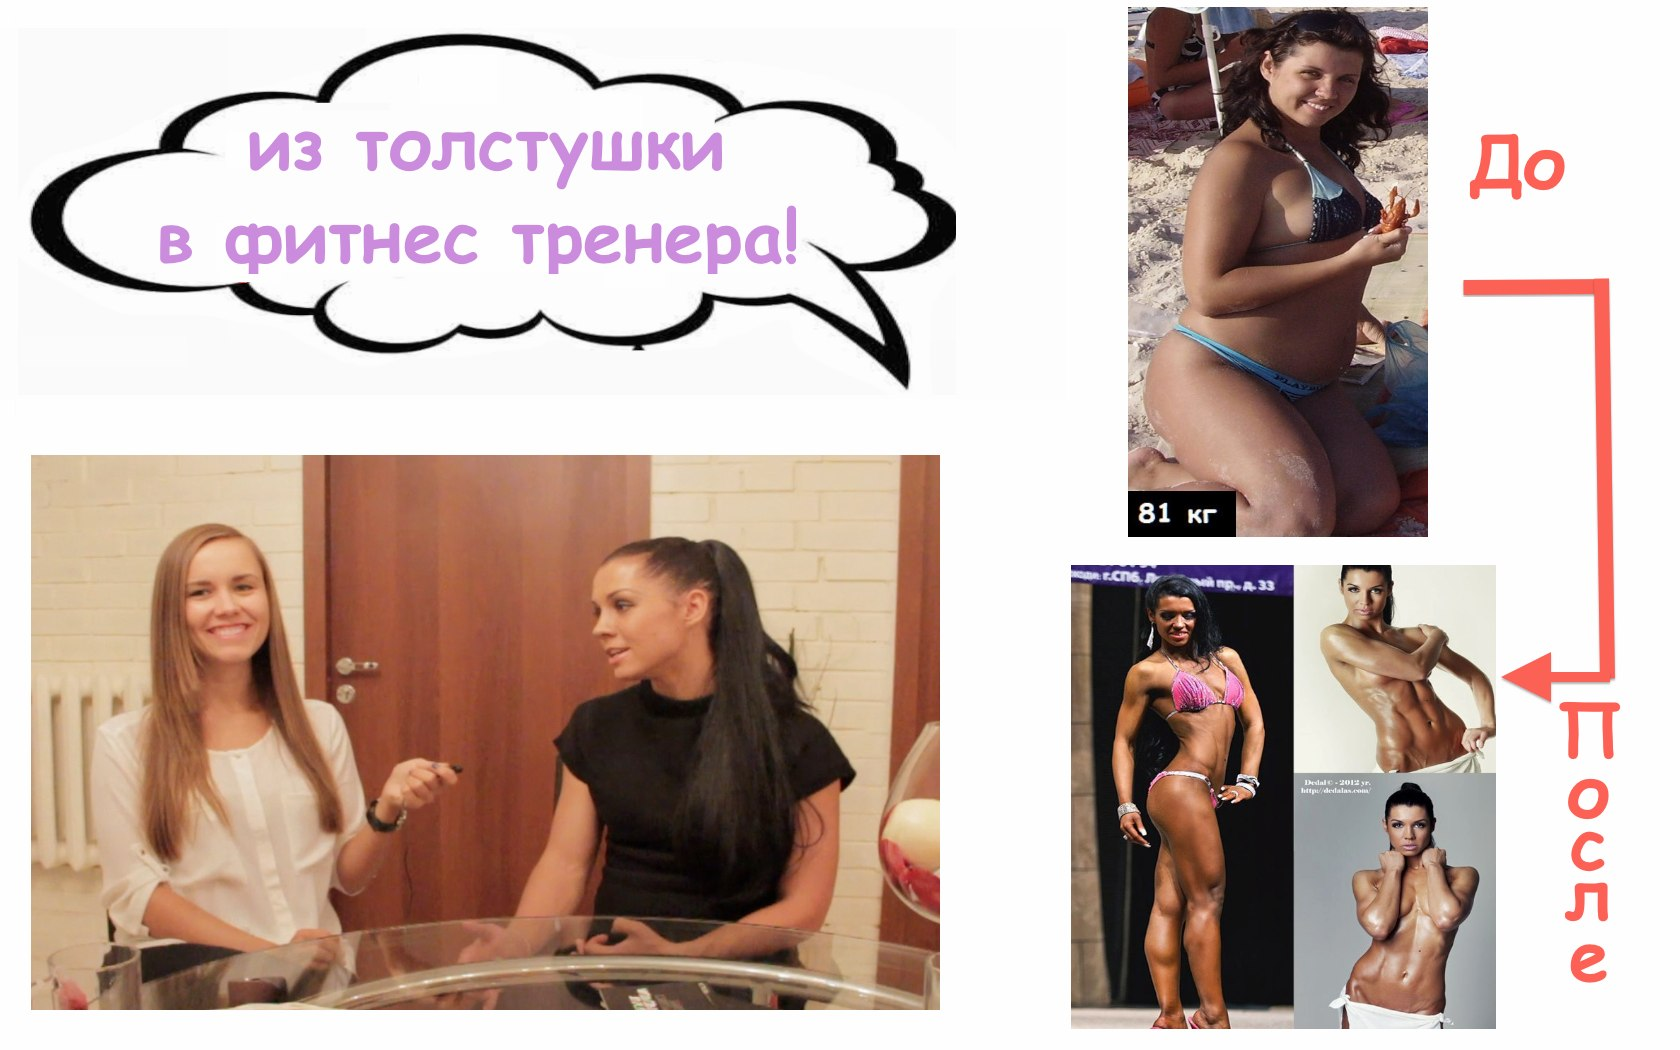 Зрелые толстушки cмотреть онлайн 13 фотография